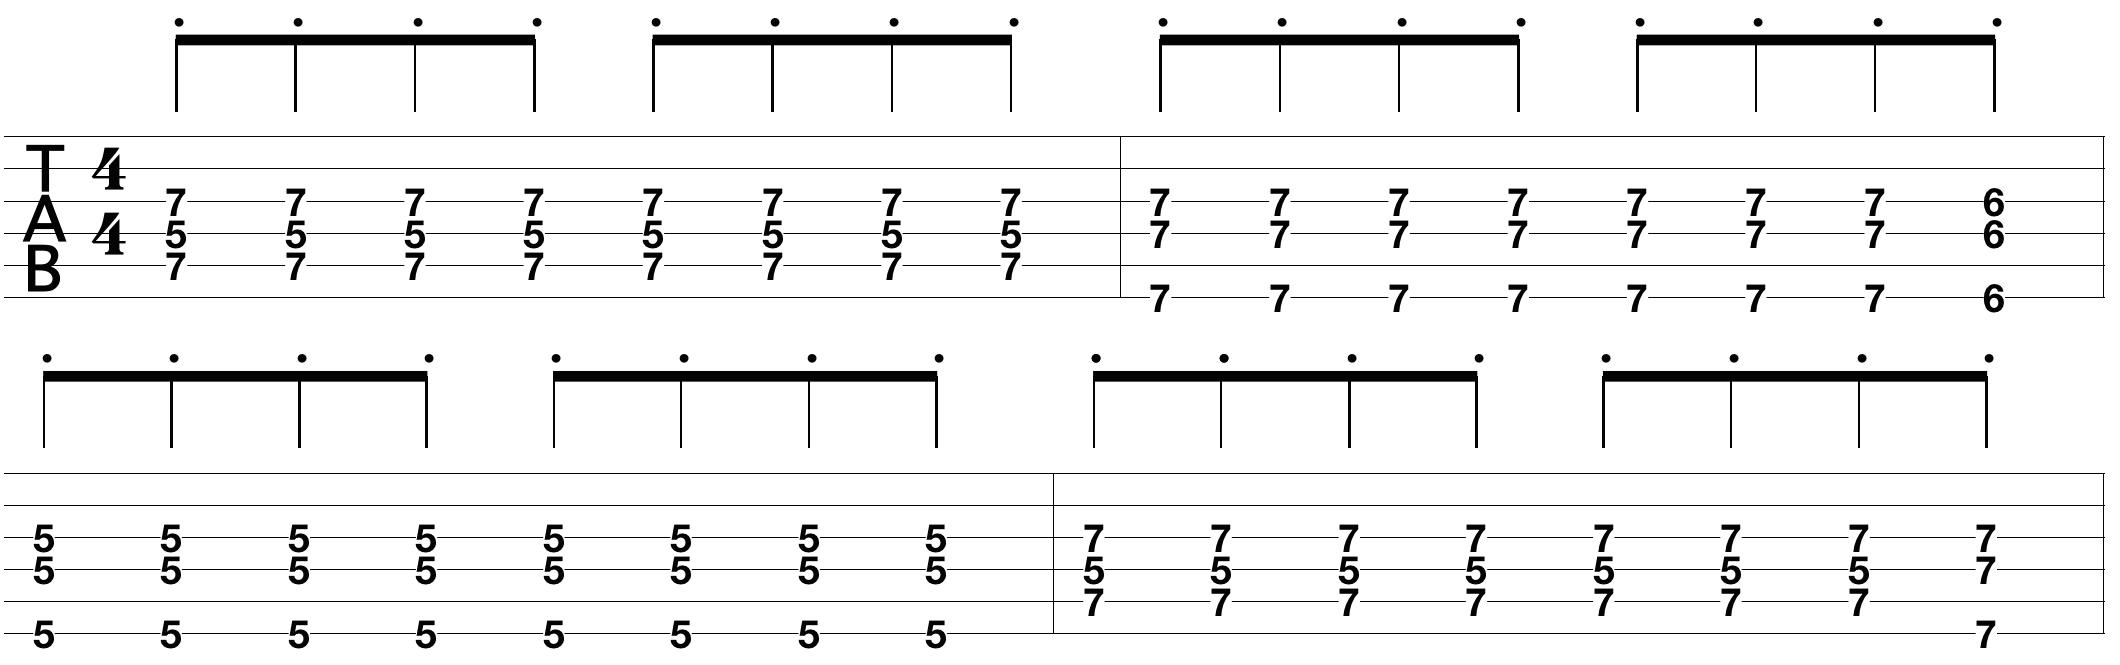 learning-rhythm-guitar_1.png